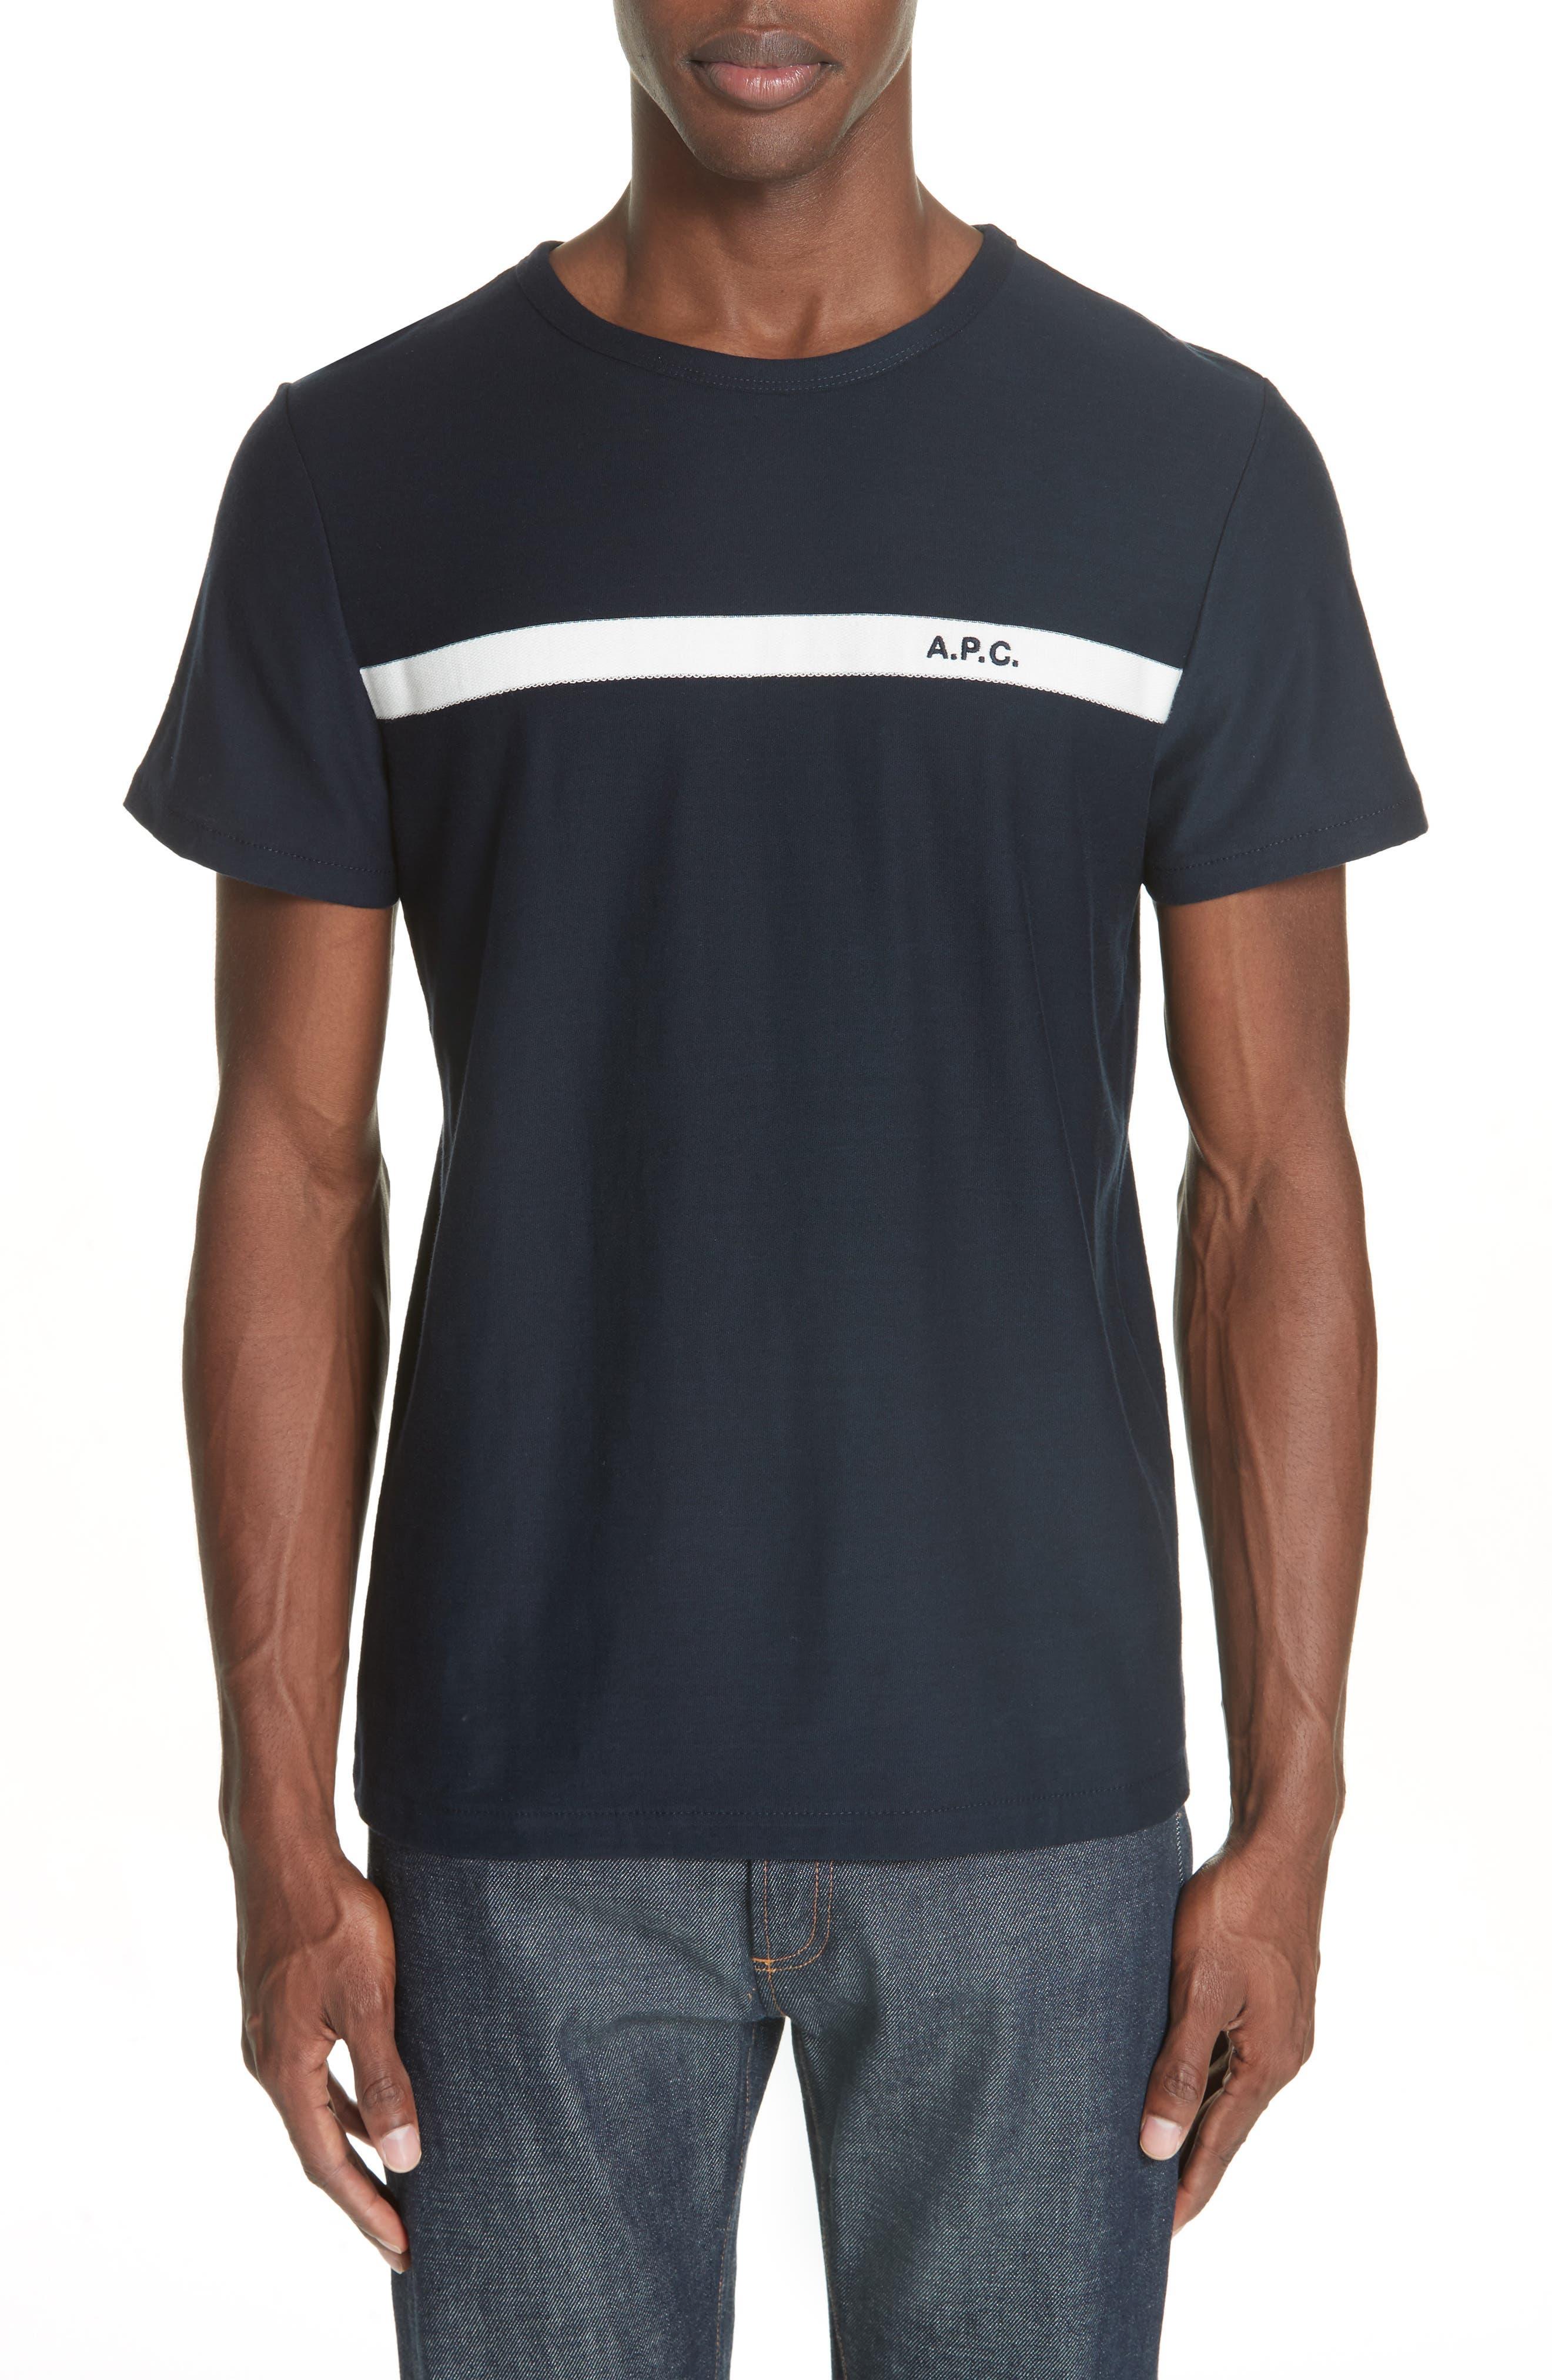 05128db655e3 Men s A.P.C. T-Shirts   Graphic Tees